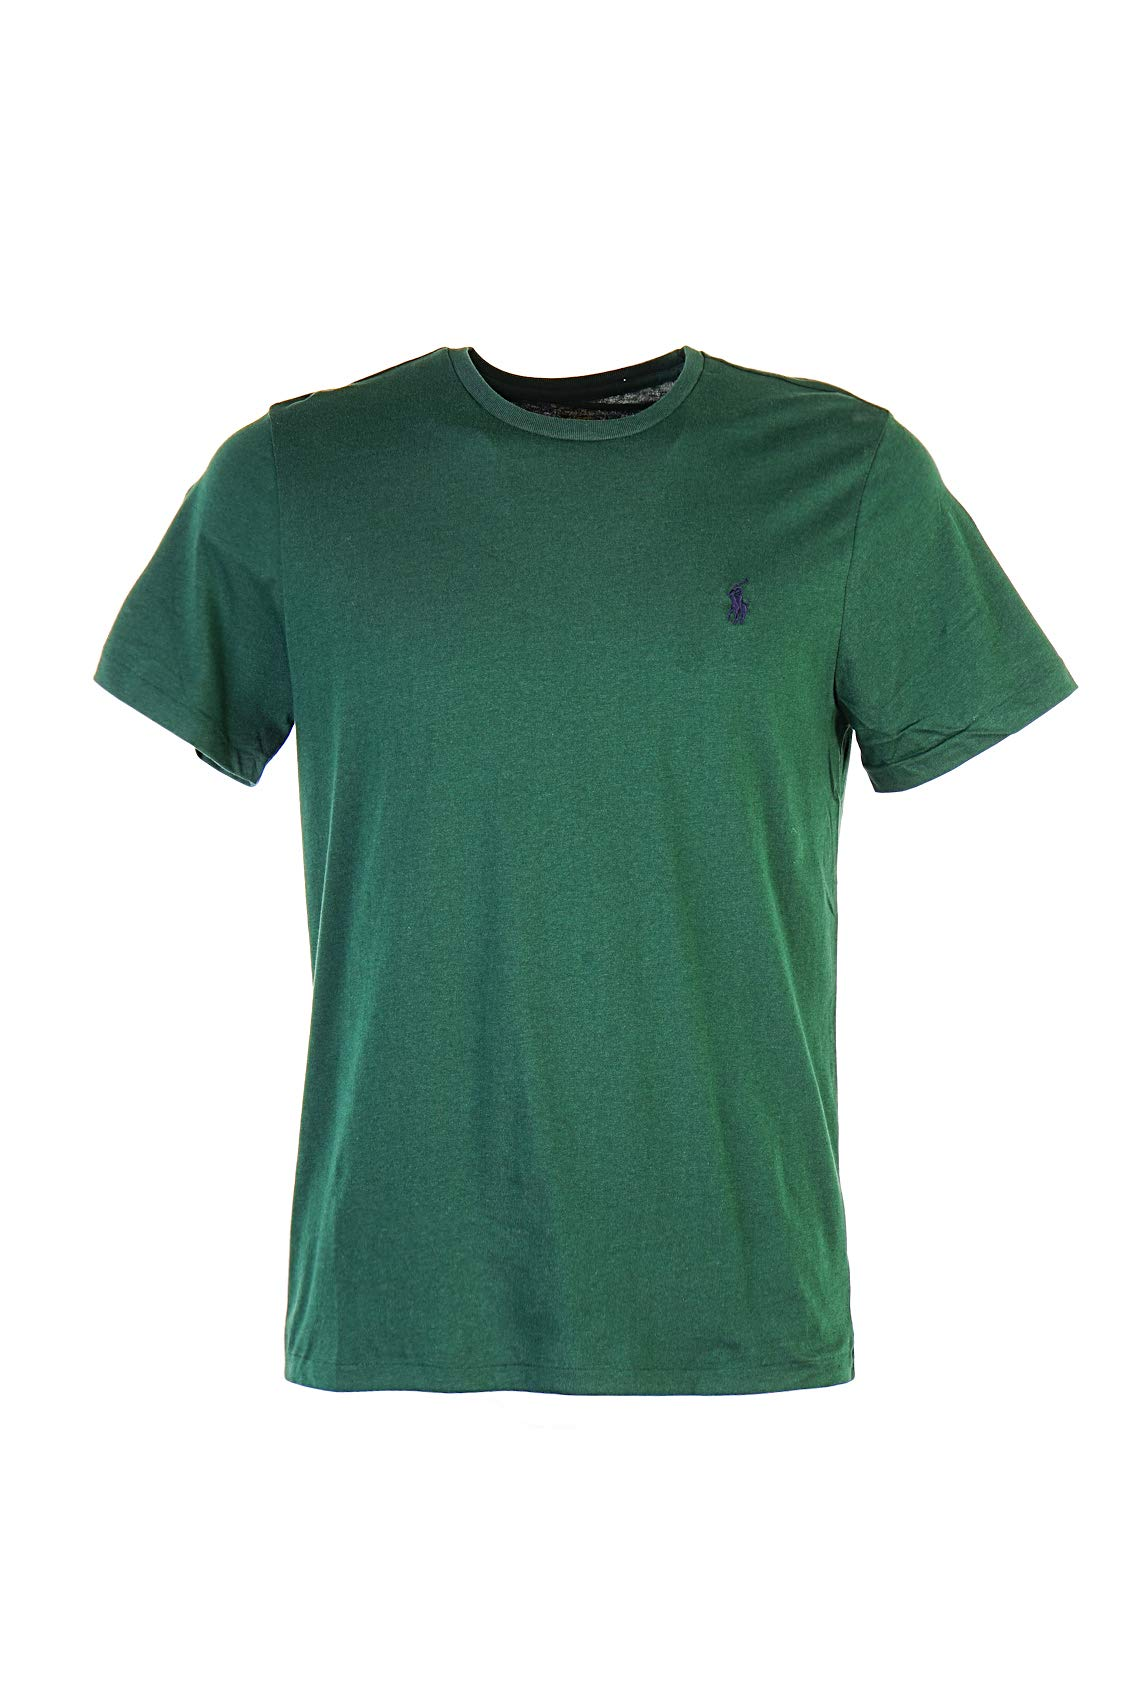 737ffce5 Polo Ralph Lauren Men's Crew Neck T-Shirt (Large, Pine Green (Navy Pony))